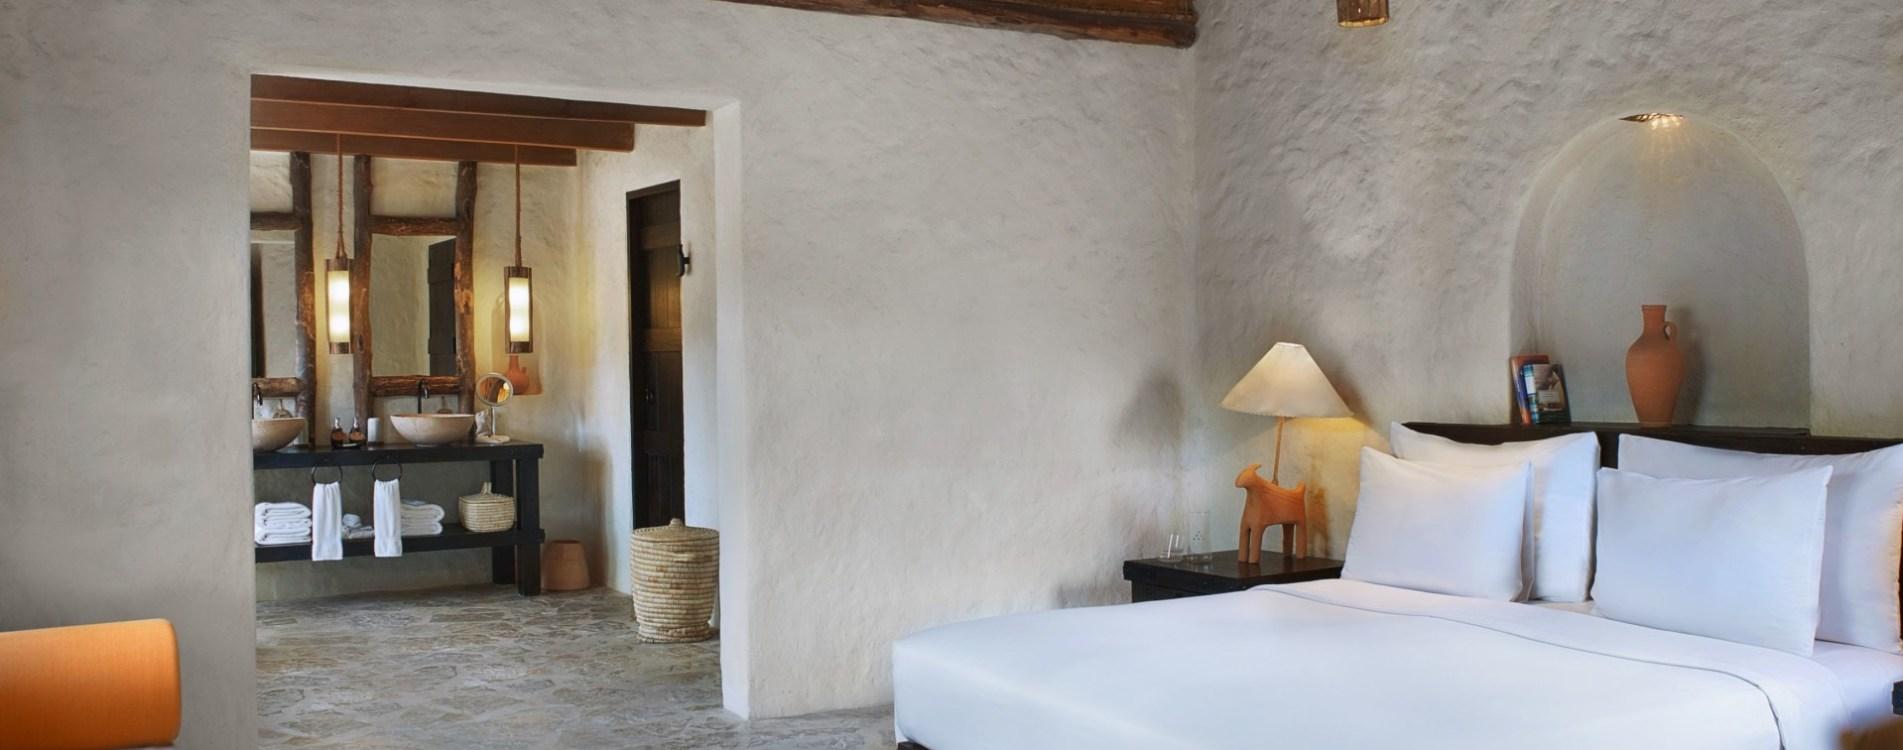 Six-Senses-Zighy-Bay-Pool-Villa-Interior-Schlafzimmer-Oman.jpg